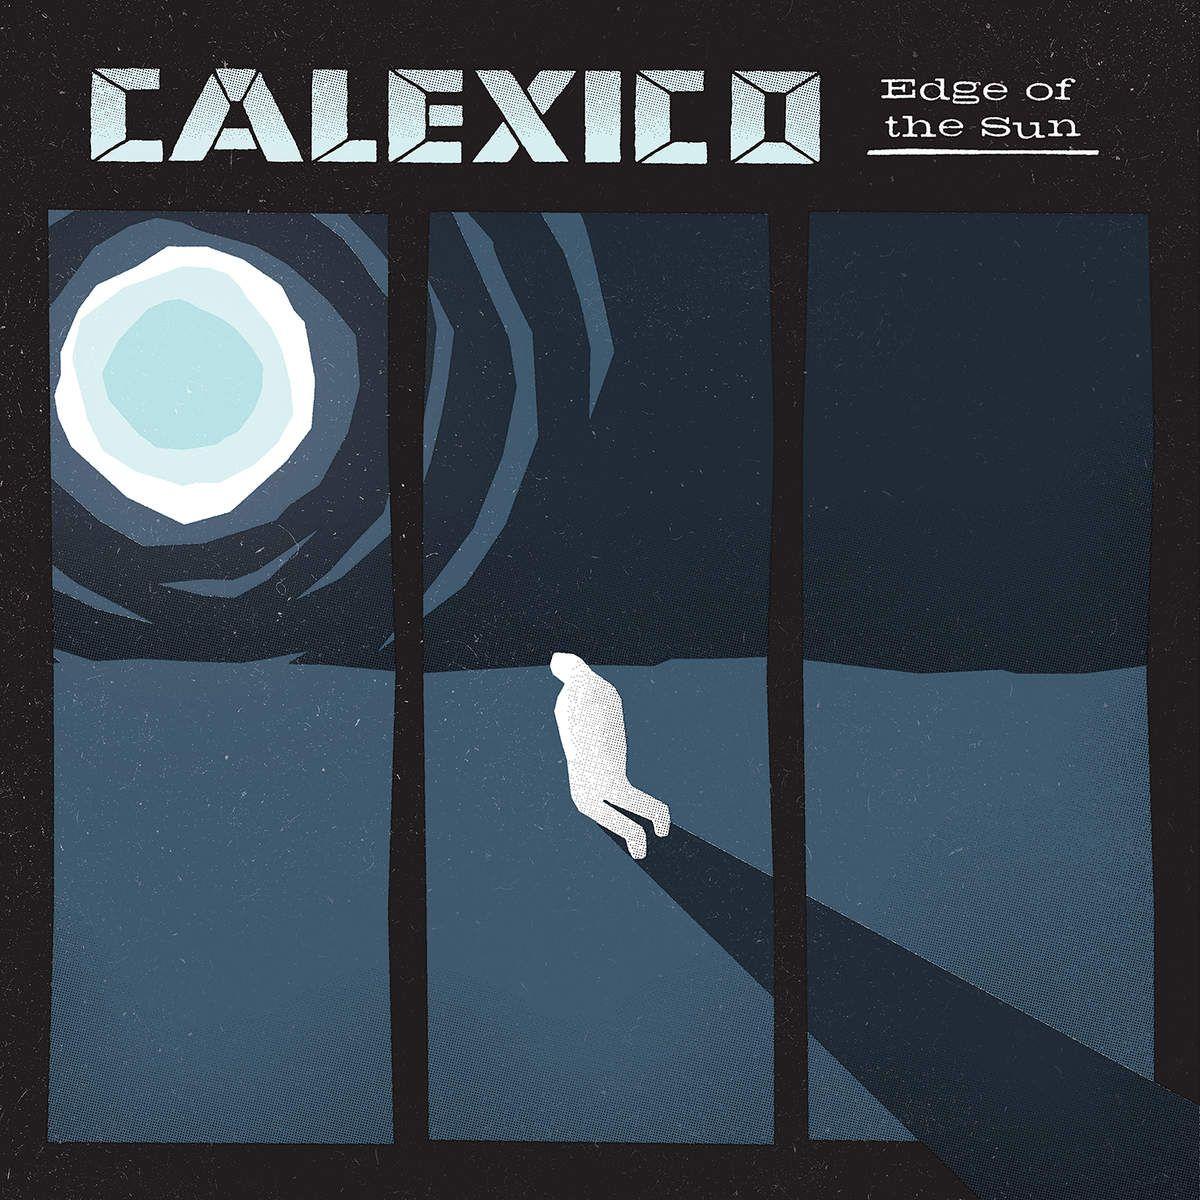 Calexico - Edge Of The Sun album cover